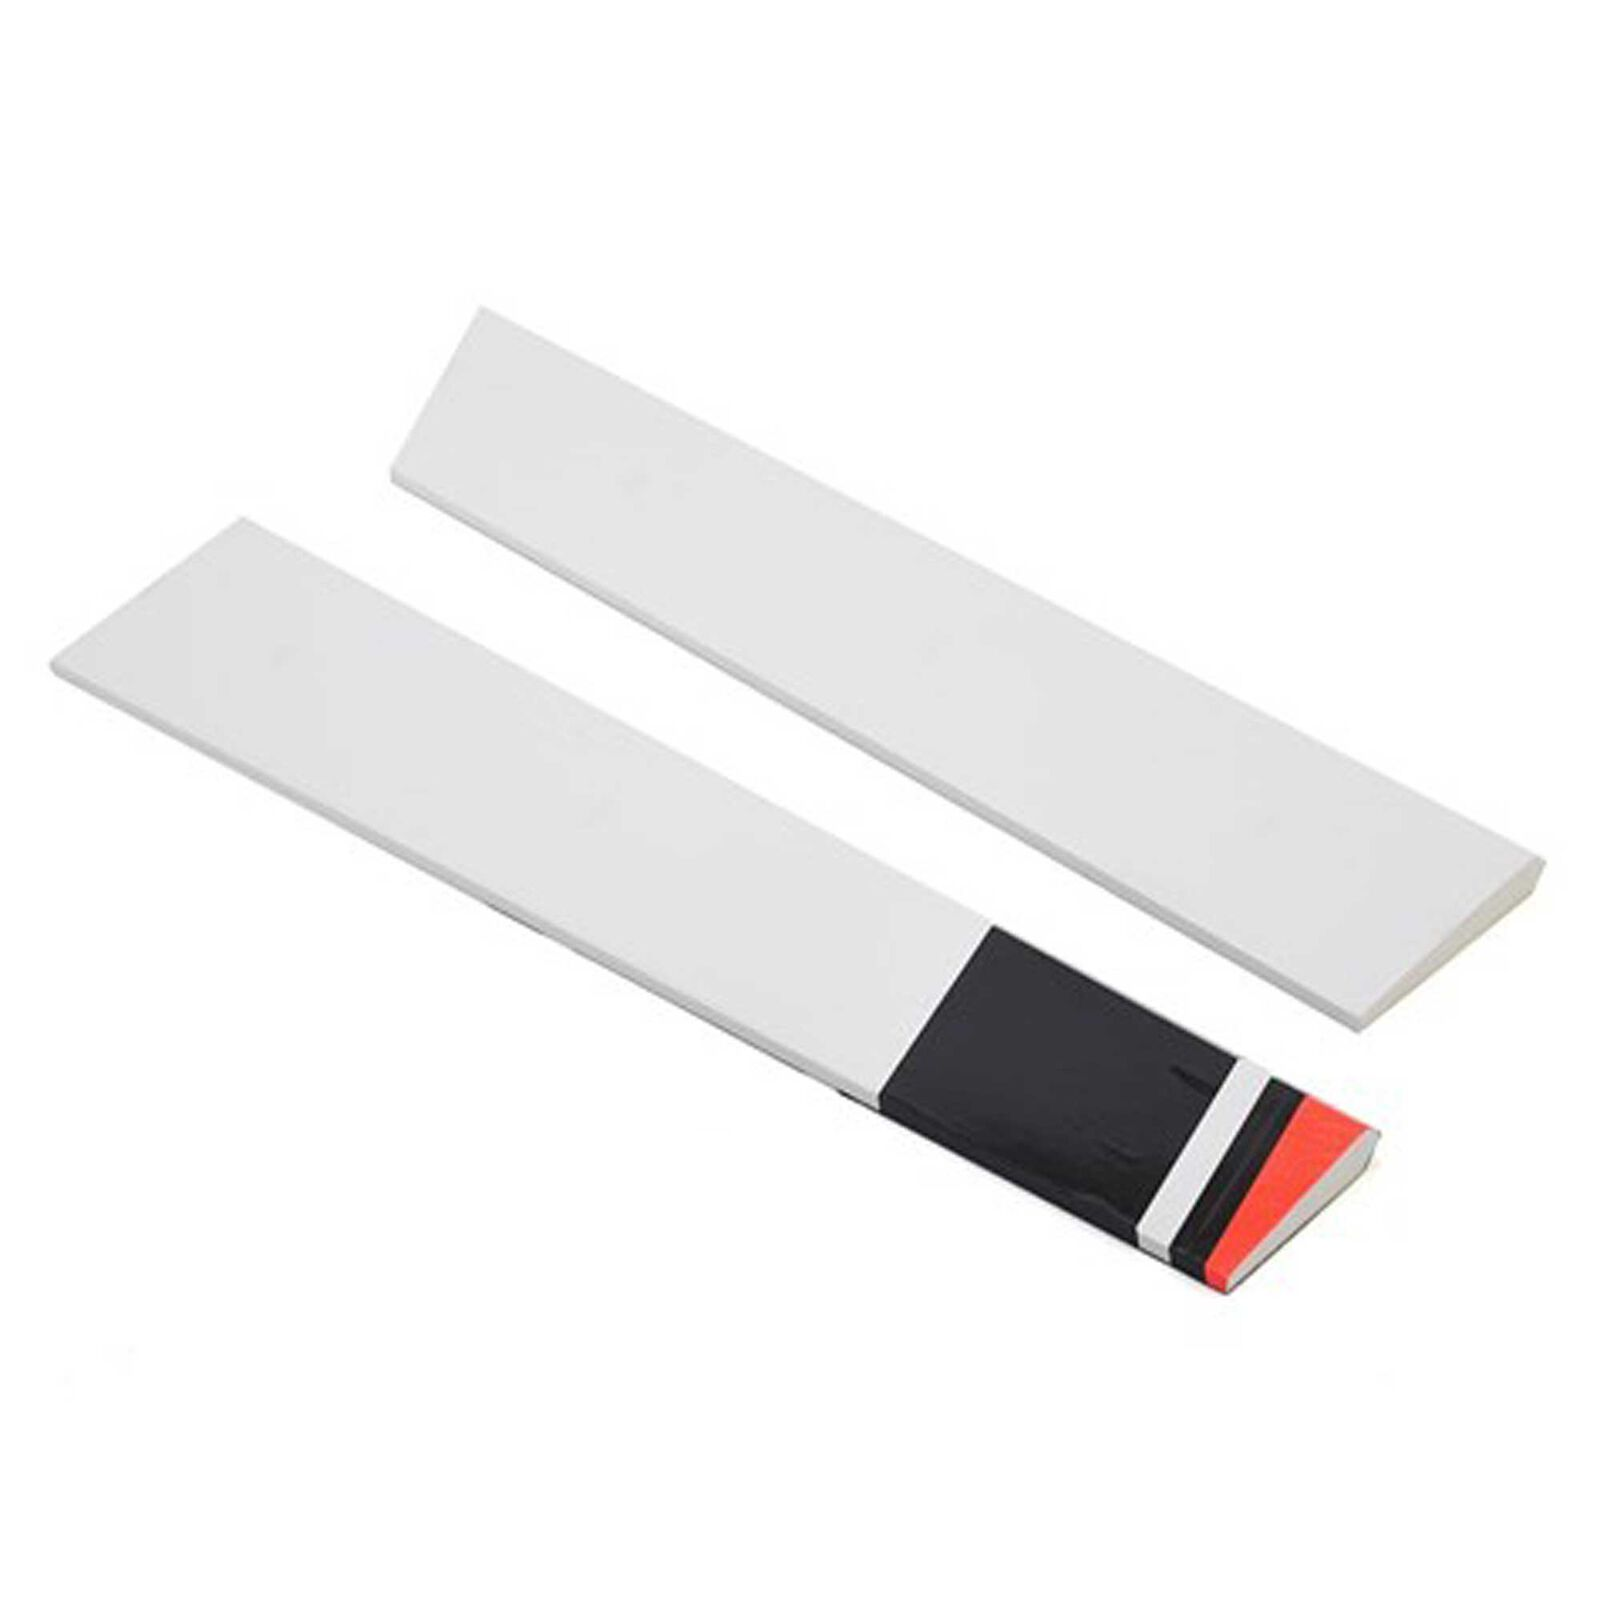 Aileron & Flap LH: Ultra Stick 10cc